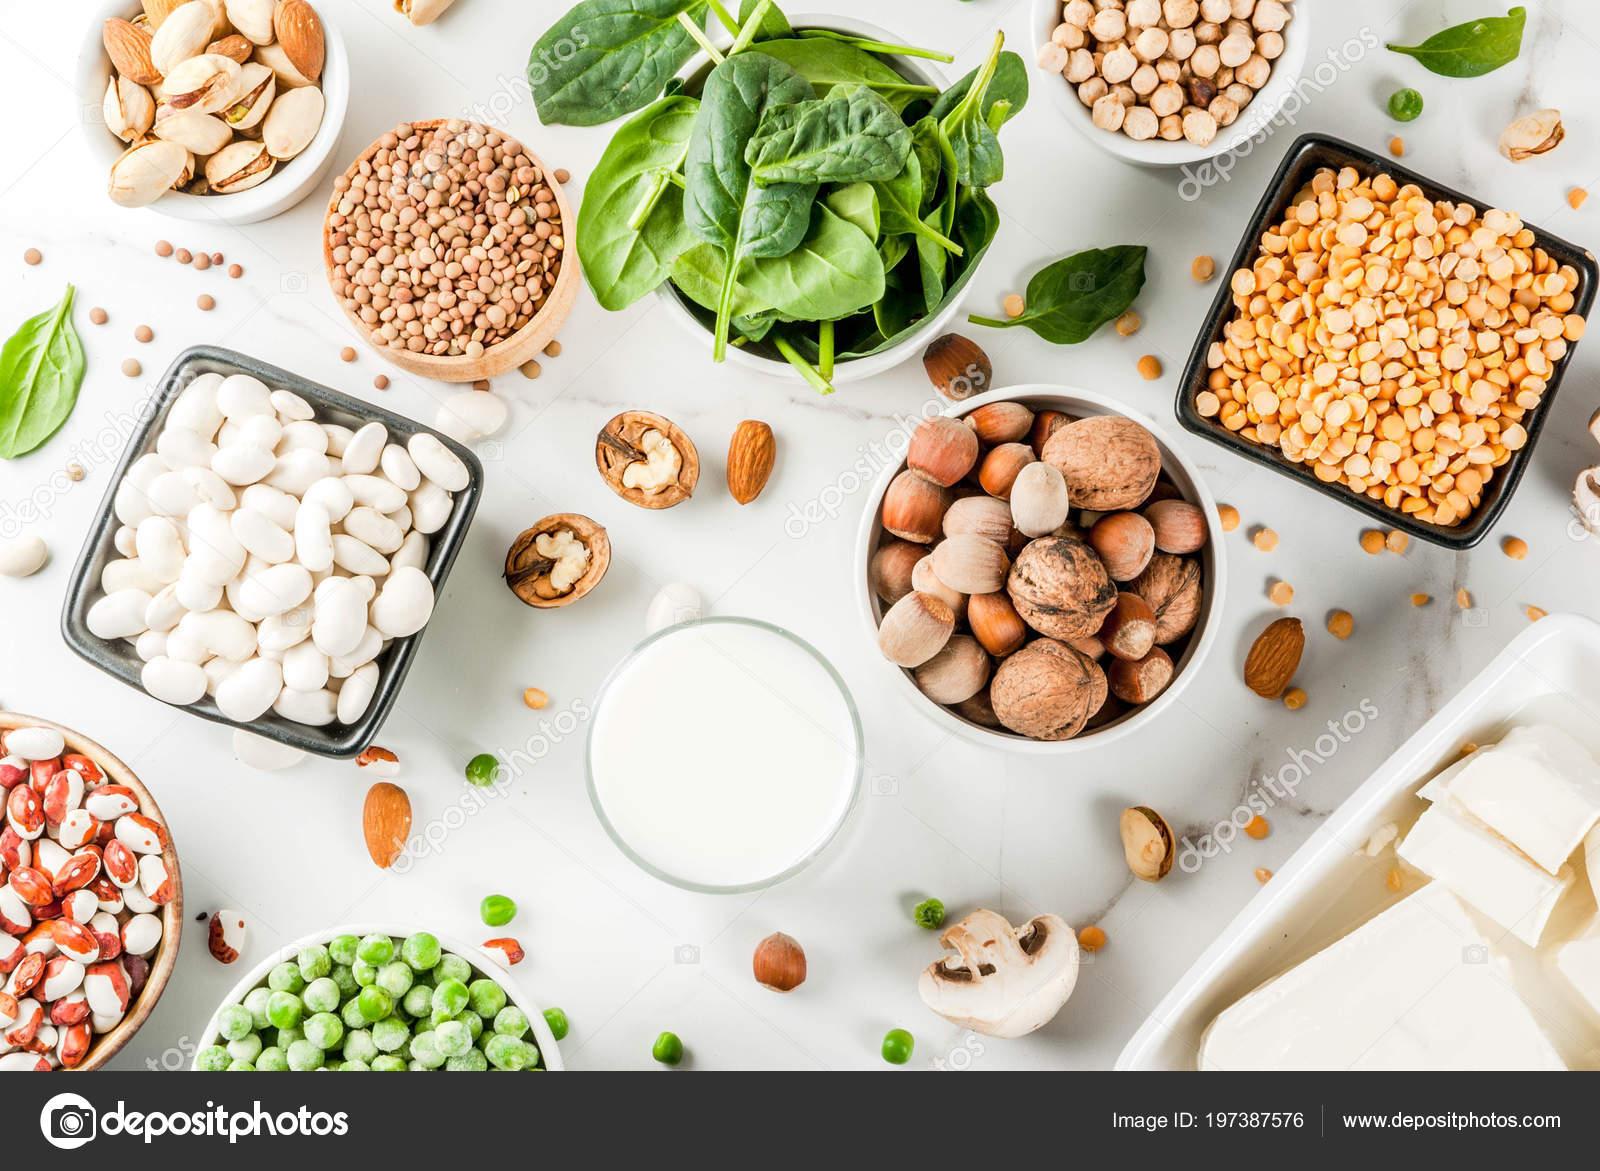 Frutos secos dieta vegetariana